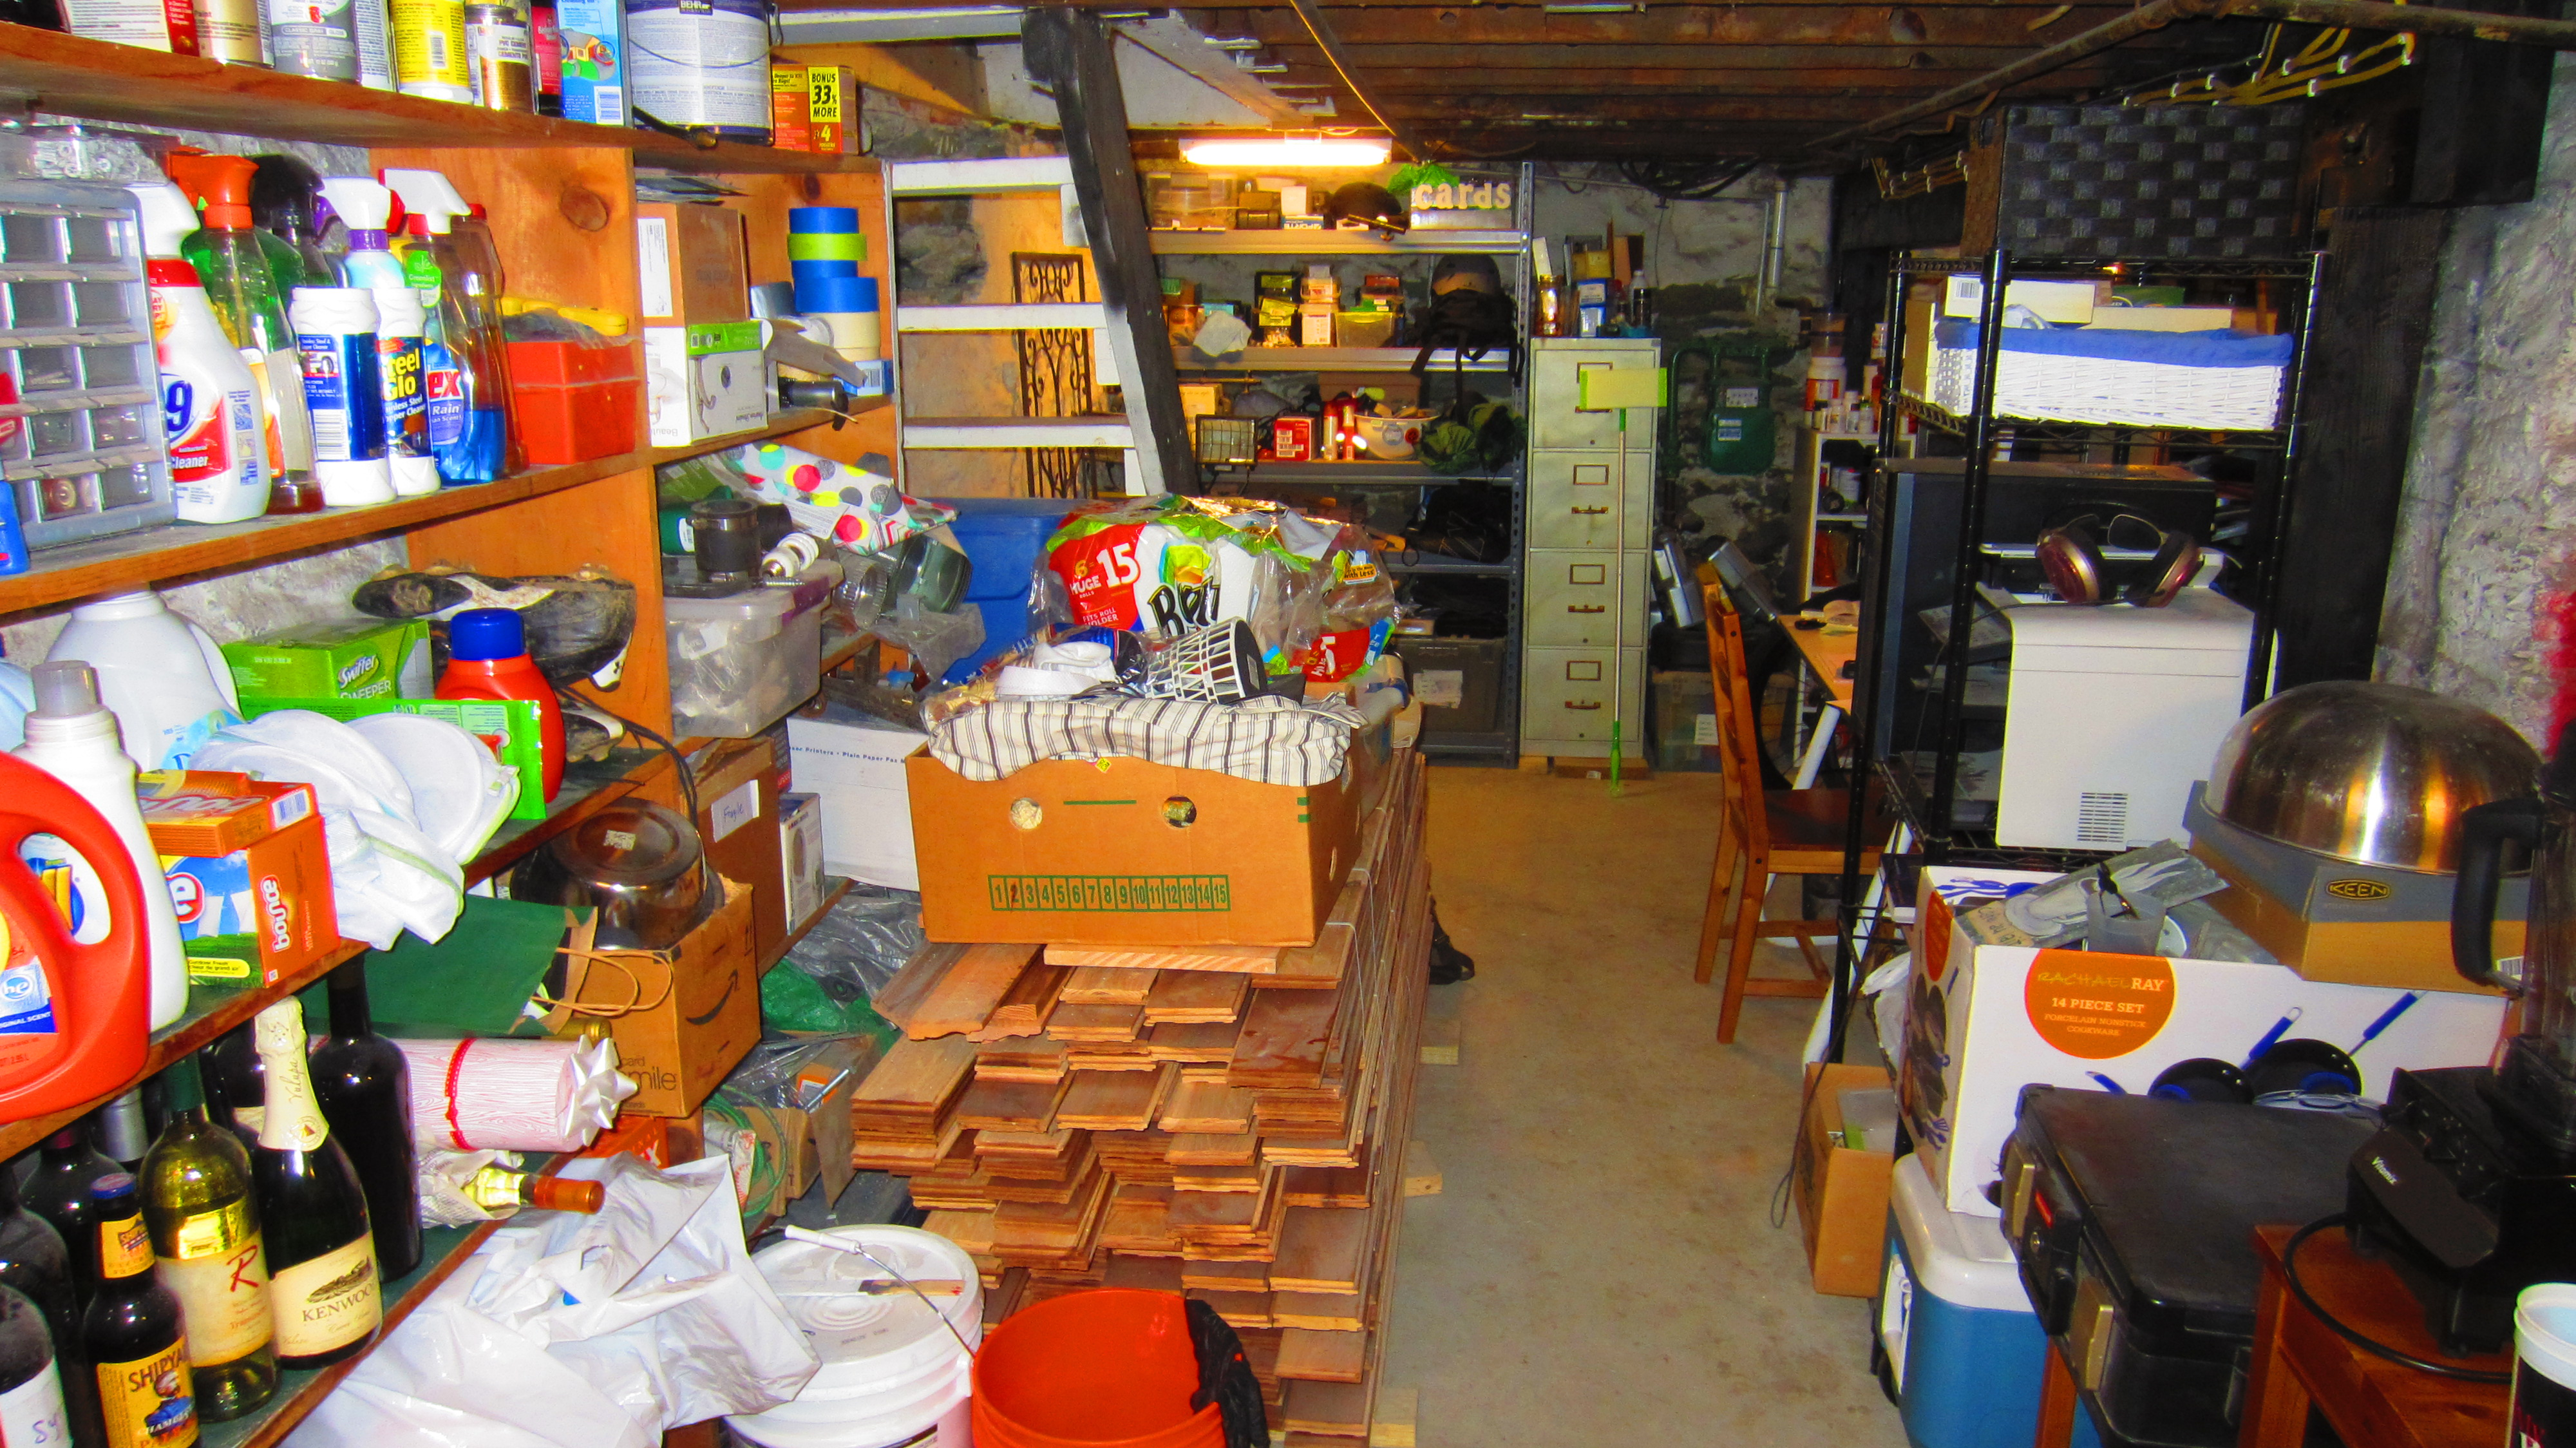 A Working Basement fice Storage Area